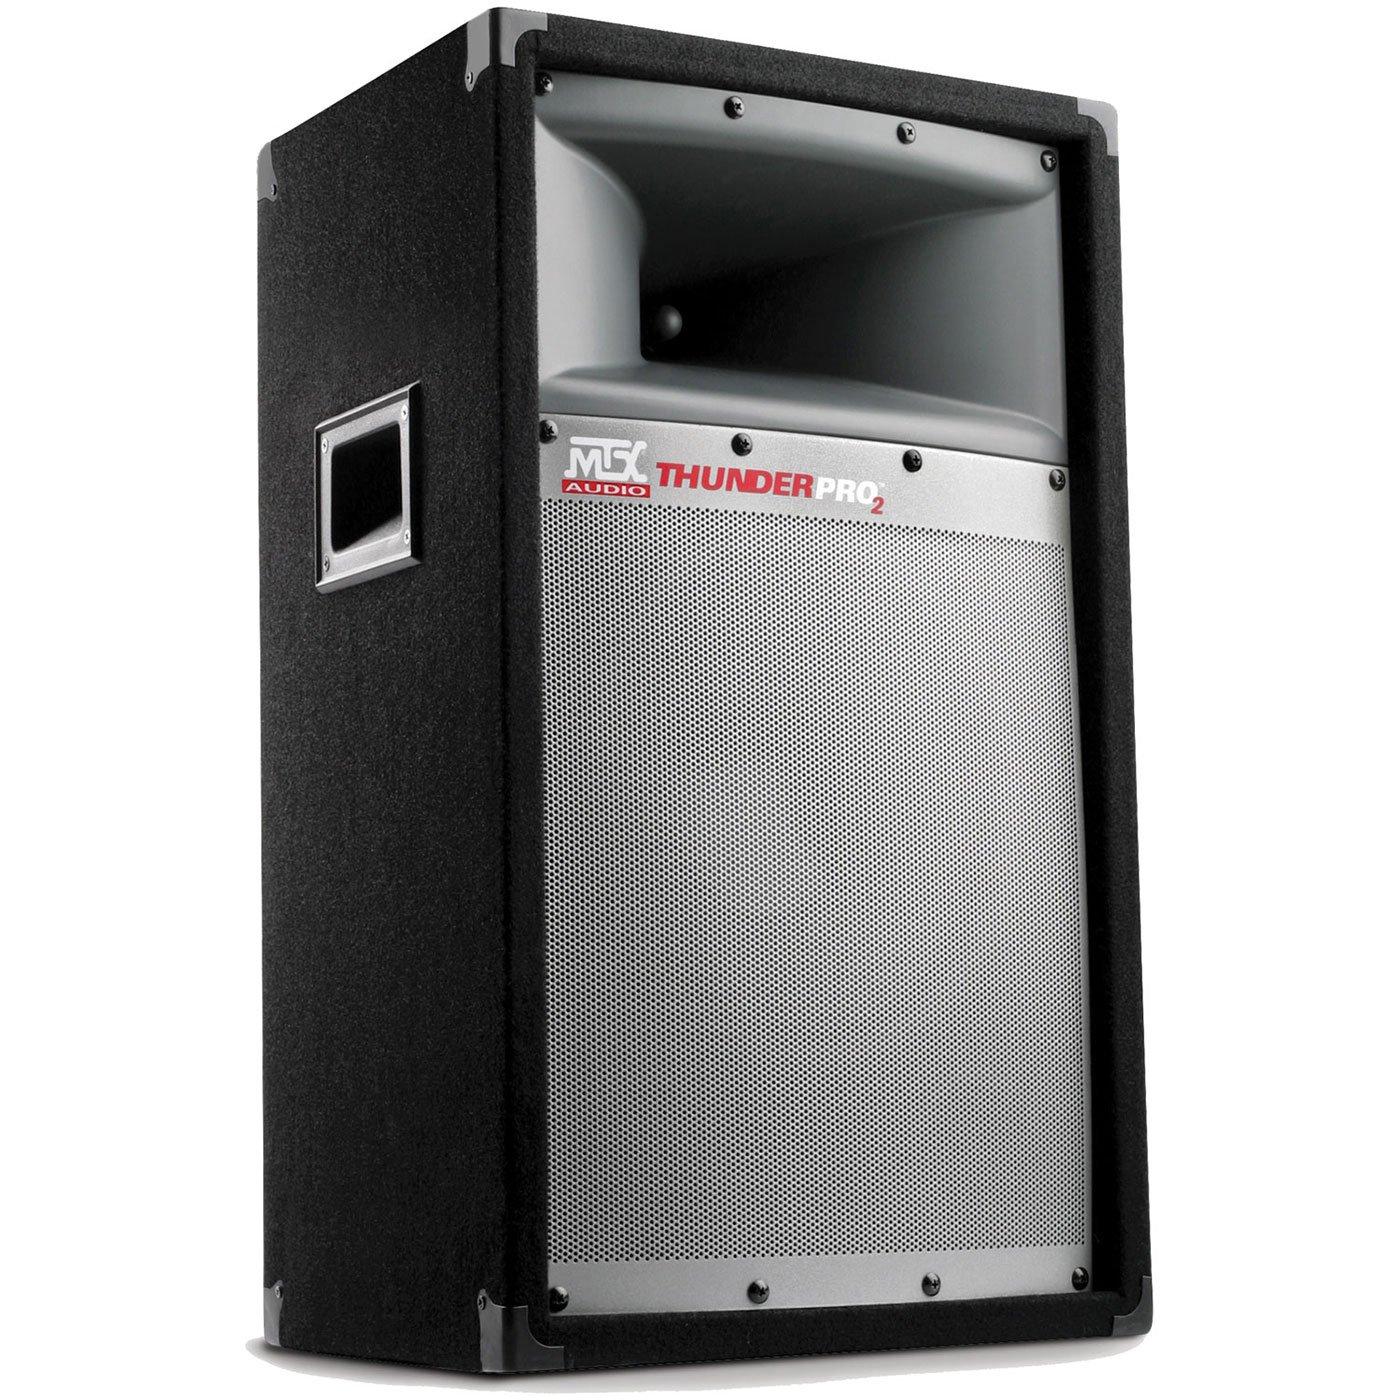 Mtx Tp1200 Audio Thunderpro Ii 2 Way Professional Baby Boomer 600w Dual 8quot Subwoofer Electronicswoot Loudspeaker Electronics